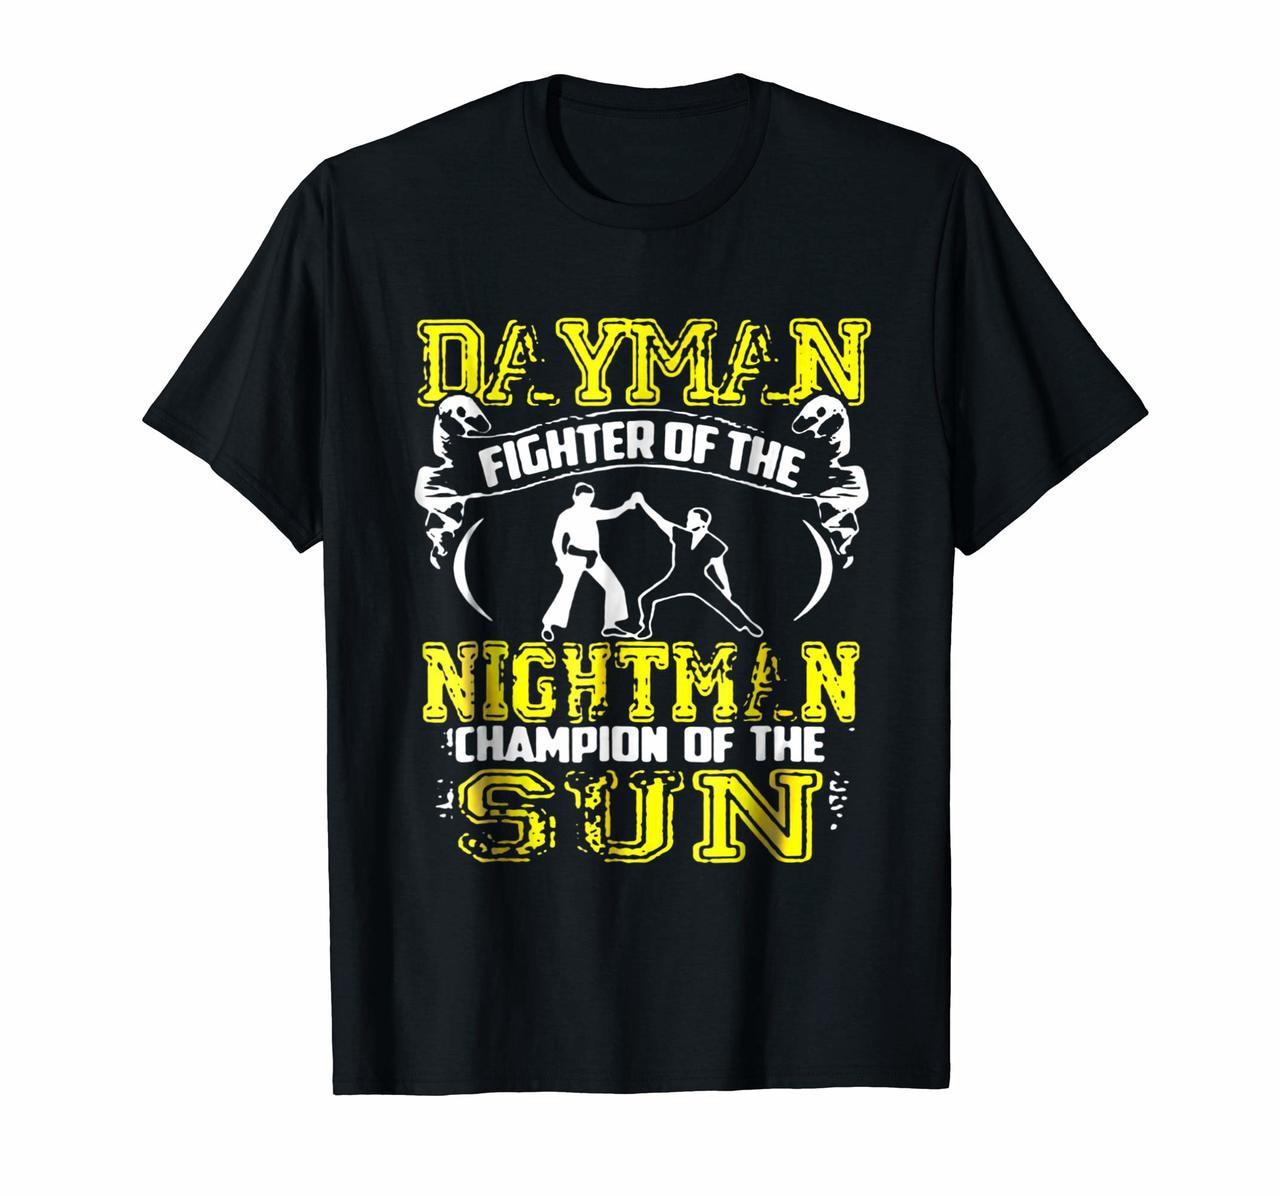 Camiseta DAYMAN FIGHTER OF THE NIGHTMAN S3147, camiseta para hombre, mujer, hombre, chica, camisetas de verano 2020